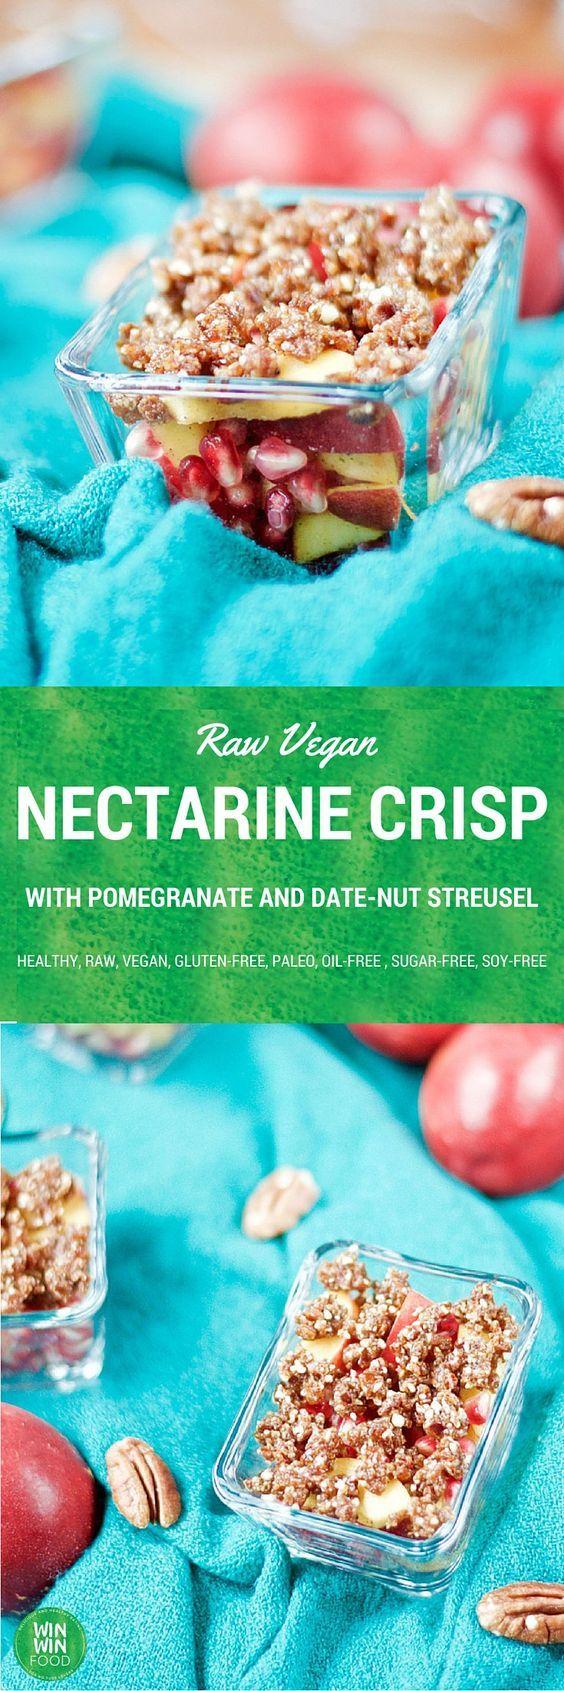 Raw Nectarine Crisp | WIN-WINFOOD.com #healthy #raw #paleo and #glutenfree treat for the summer